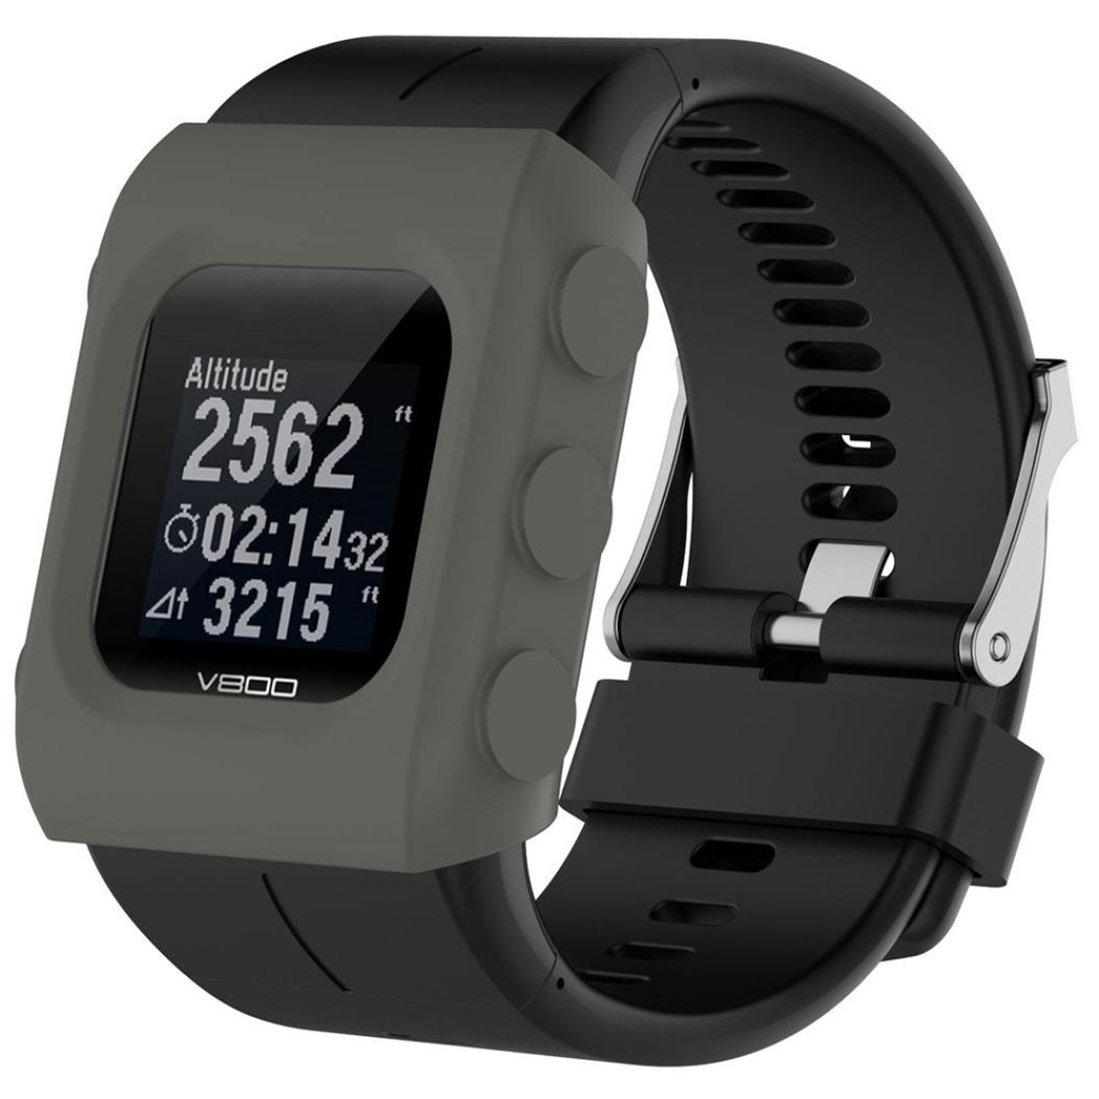 Carcasa Funda Silicona fina reloj de repuesto para Polar V800 Reloj ...